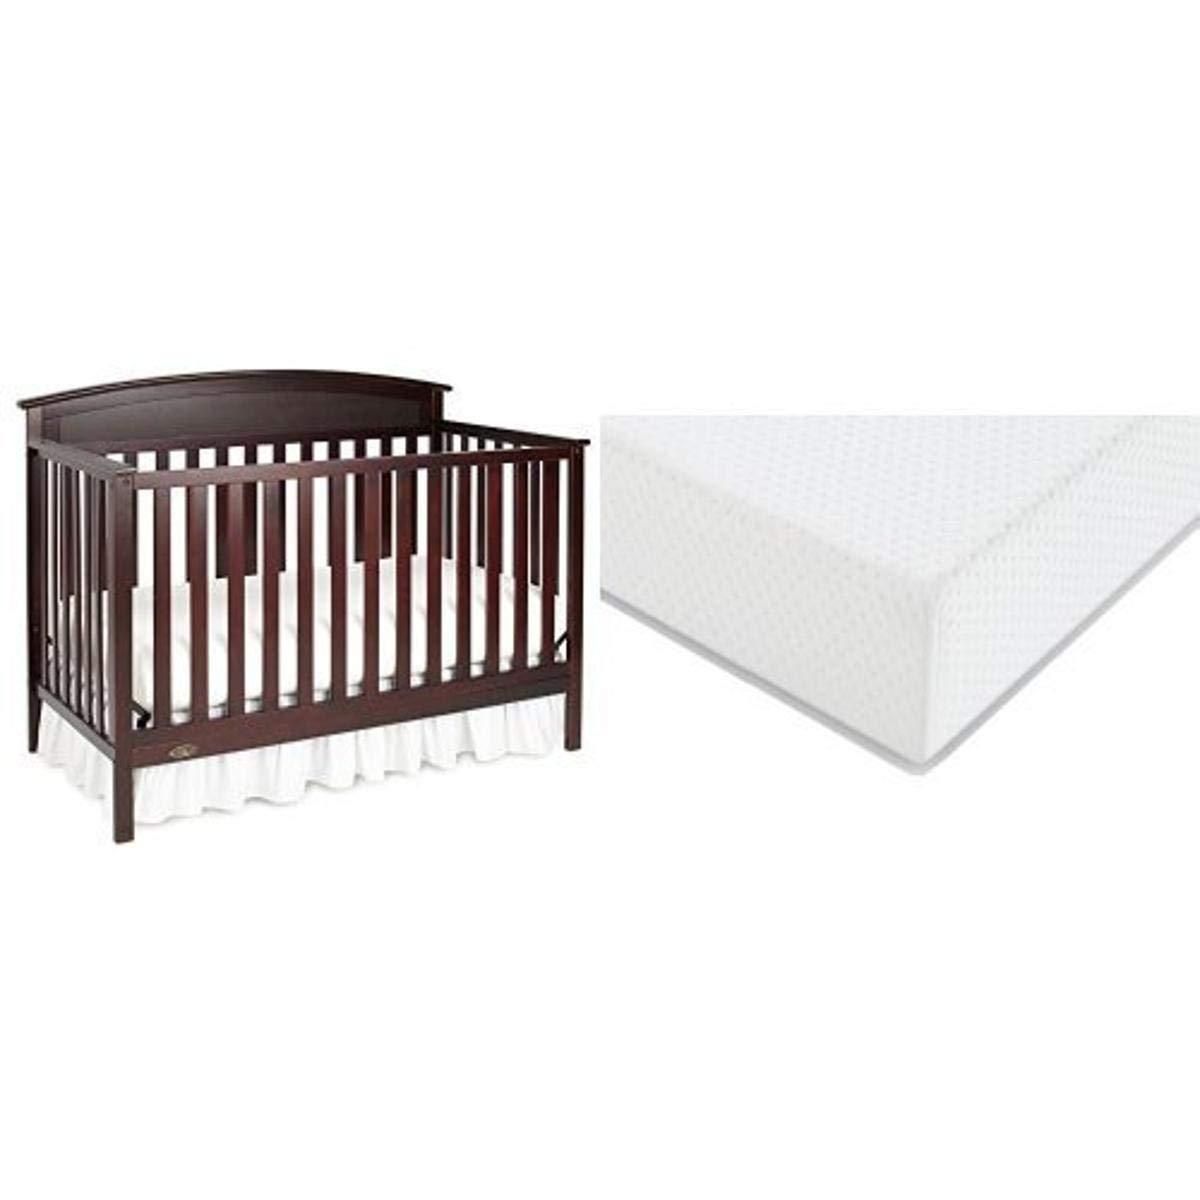 Graco Benton Convertible Crib Graco Premium Foam Crib and Toddler Bed Mattre